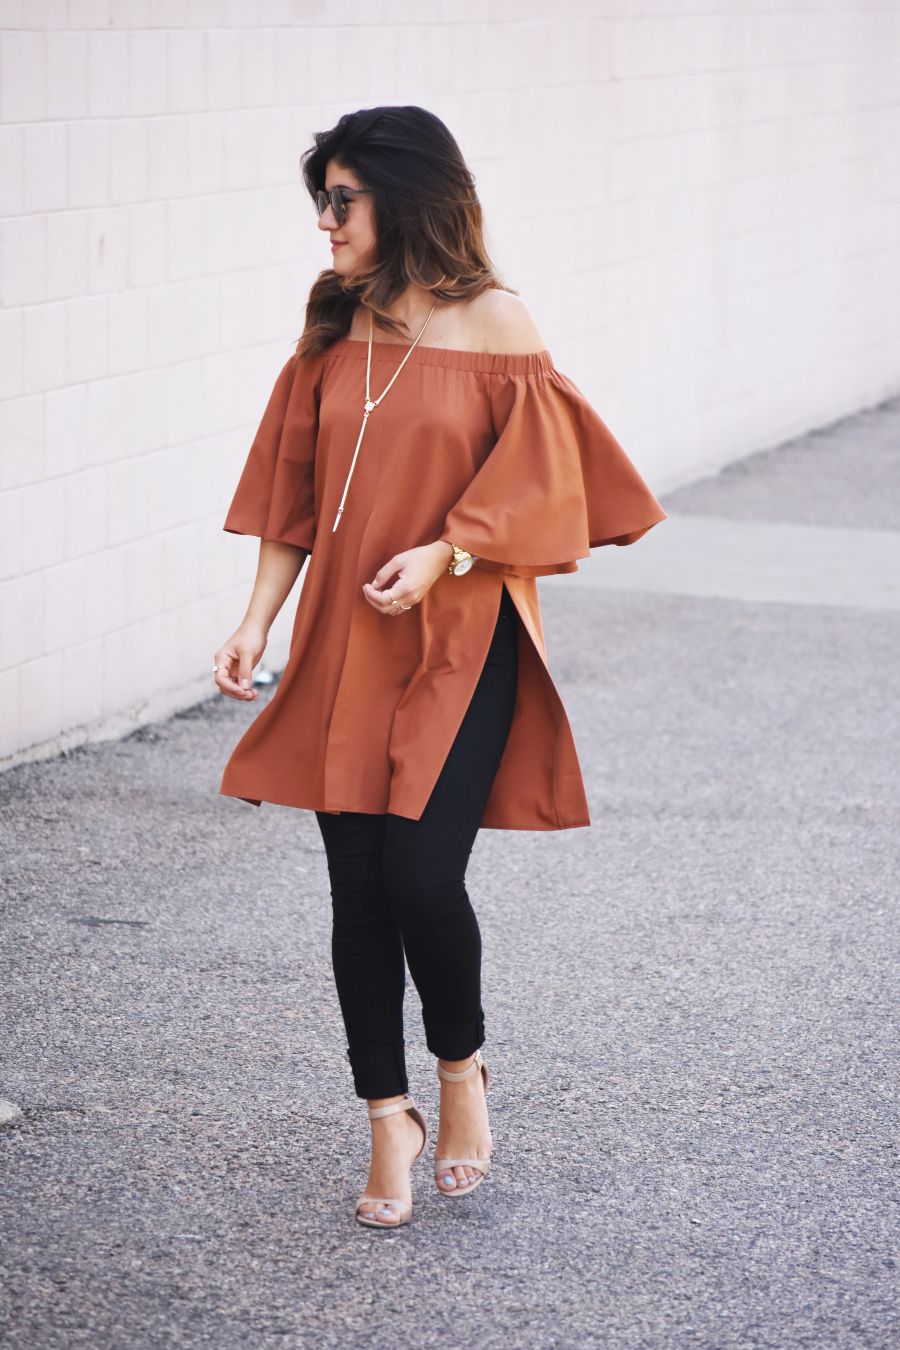 Off the shoulder rustic orange top